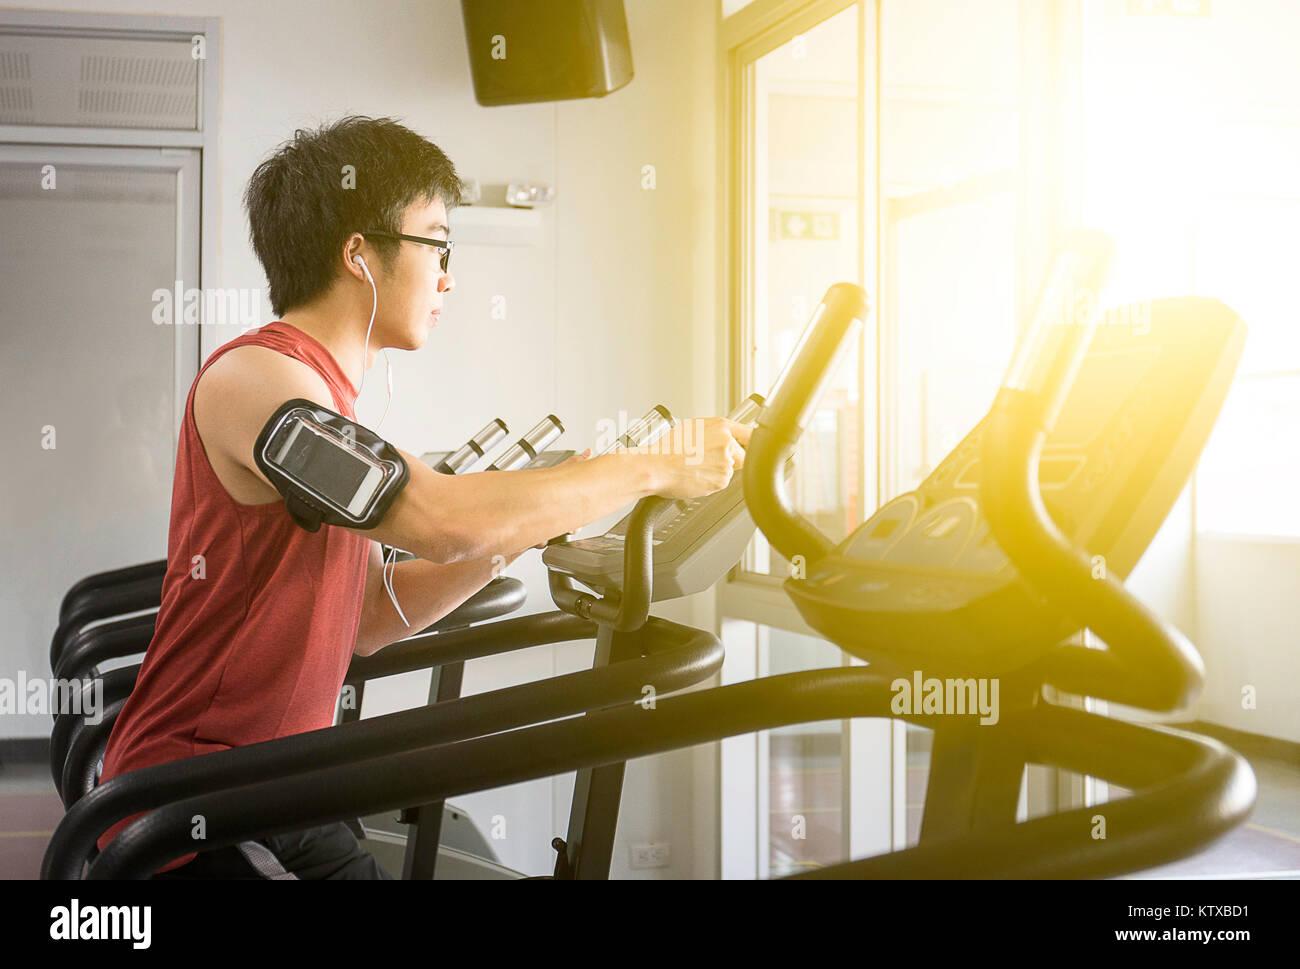 Exercise machine cardio weight stock photos